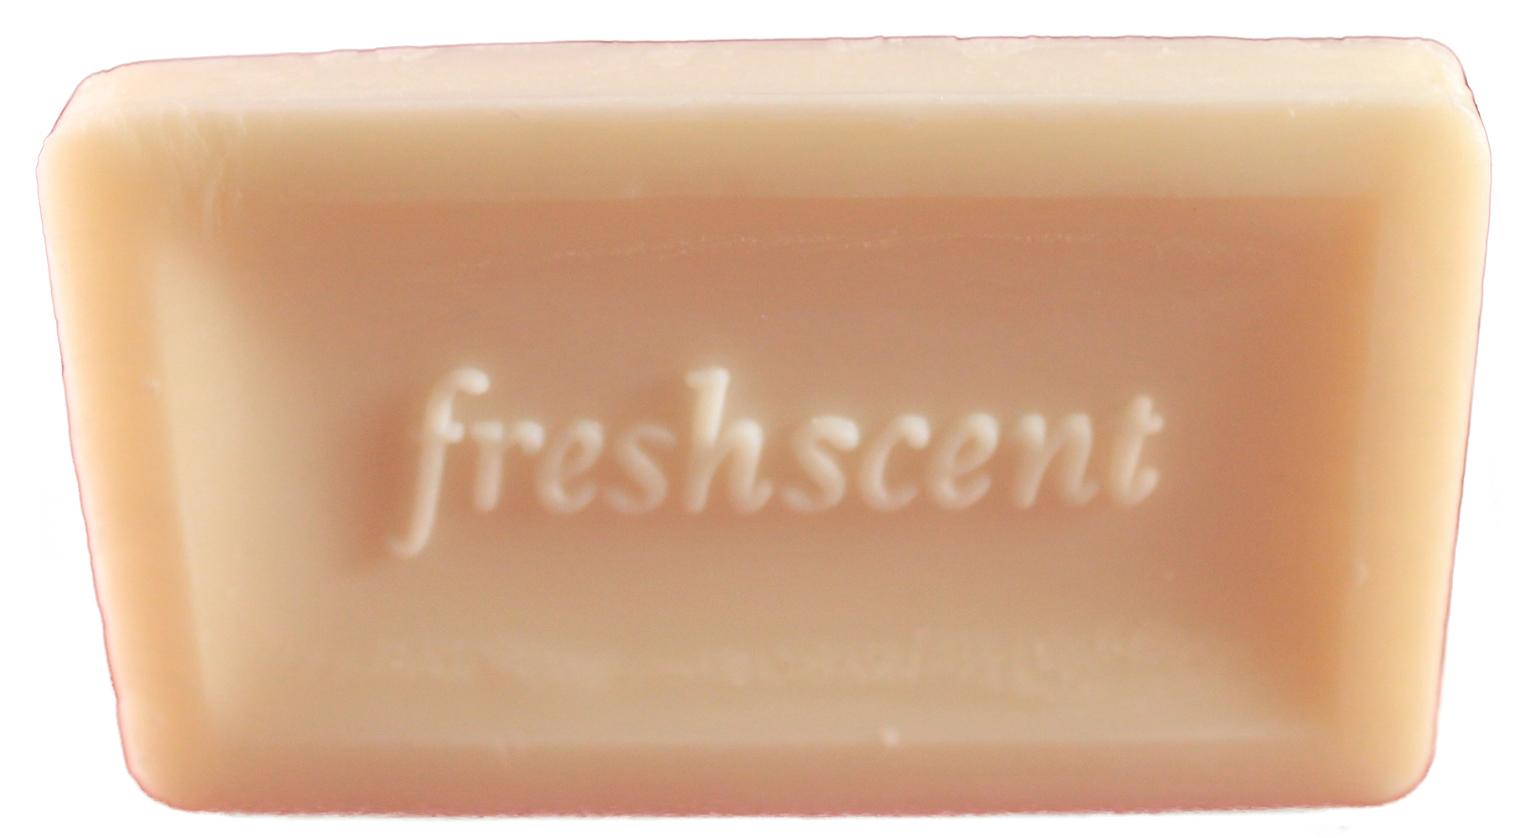 Freshscent Unwrapped Deodorant Bar SOAP .85 oz [1257696]